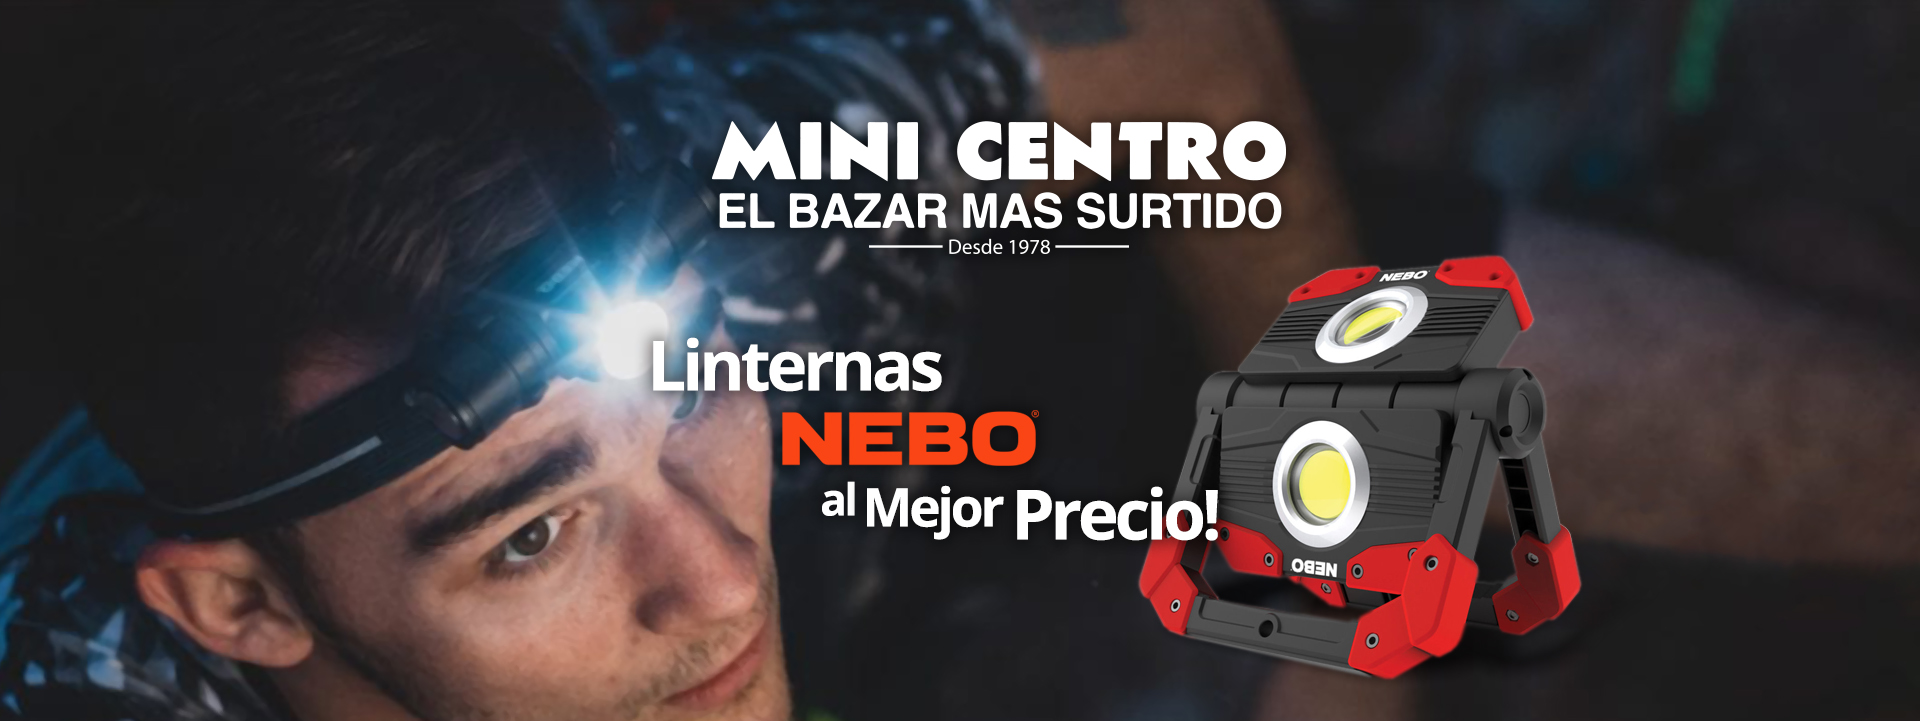 Banner_Nuevo_1.jpg